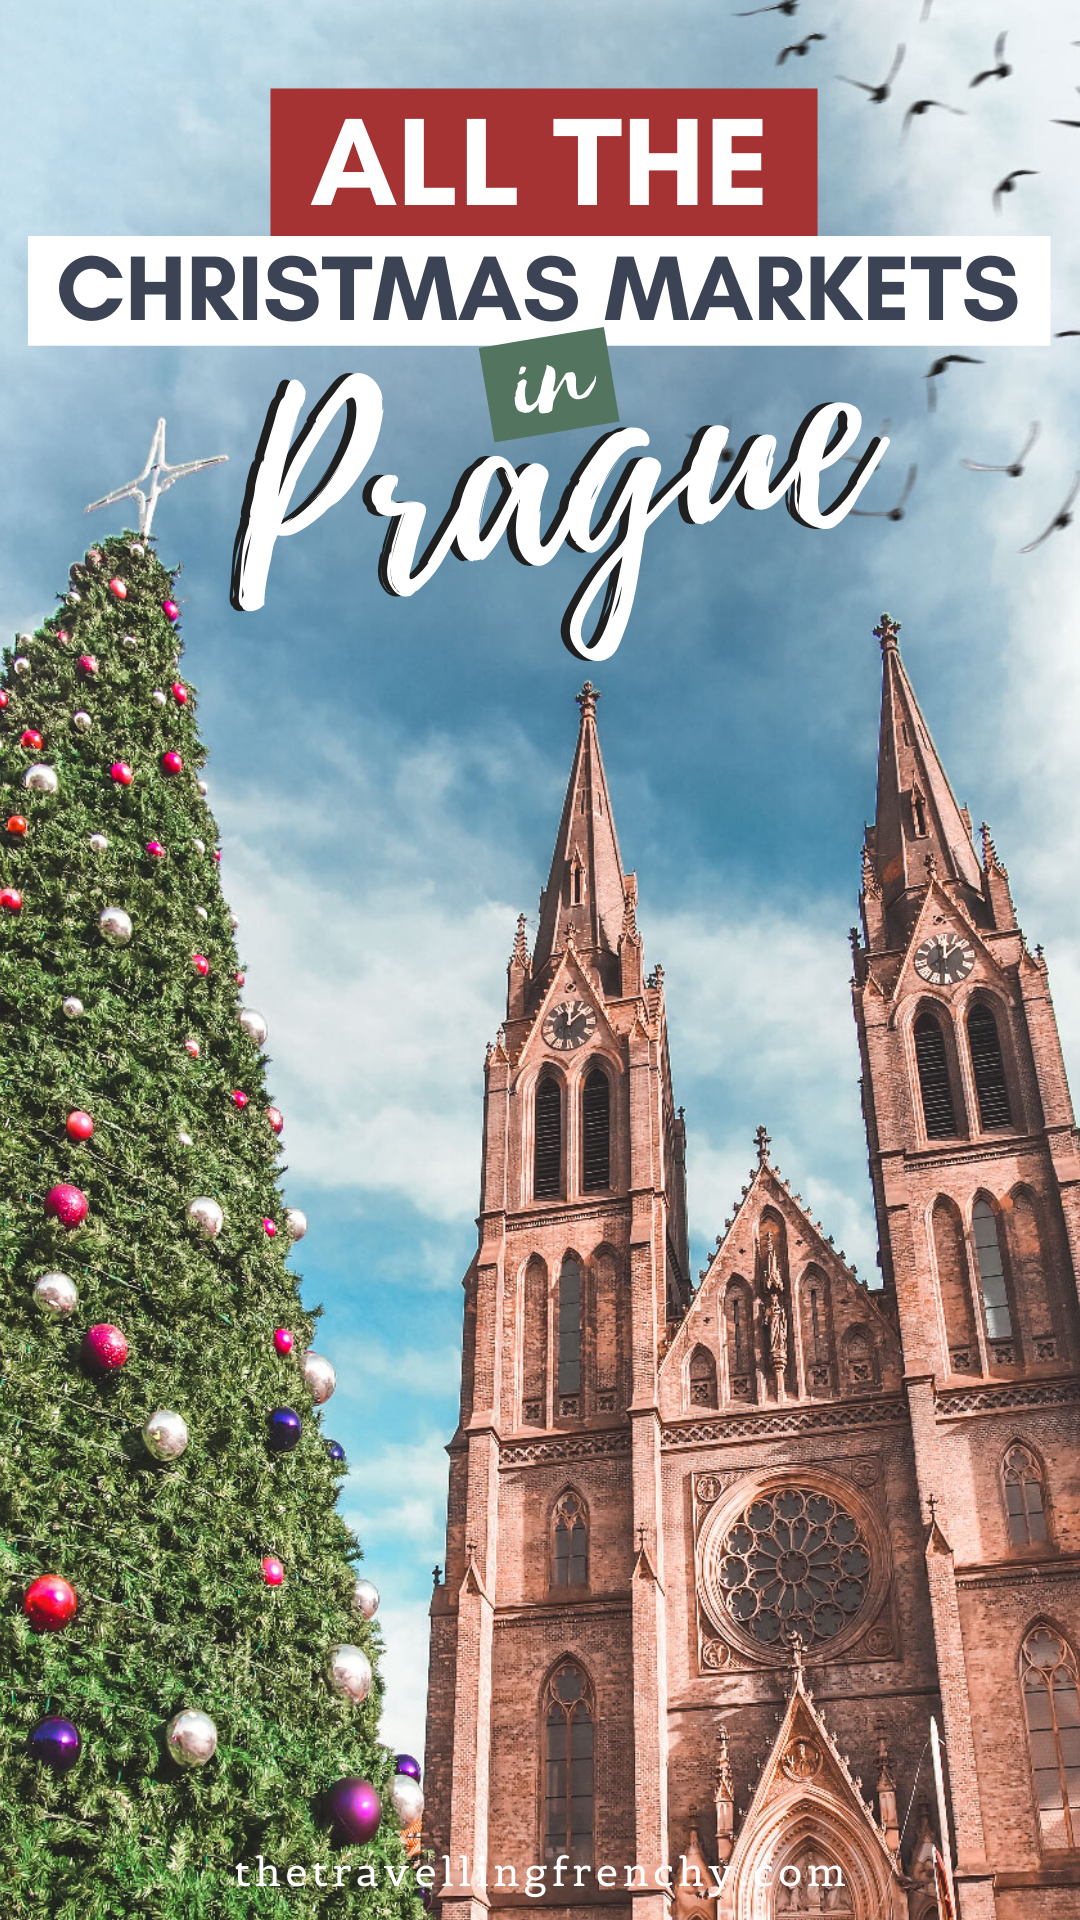 Full List Of Prague S Christmas Markets For 2020 In 2020 Travel Europe Travel Destinations Europe Travel